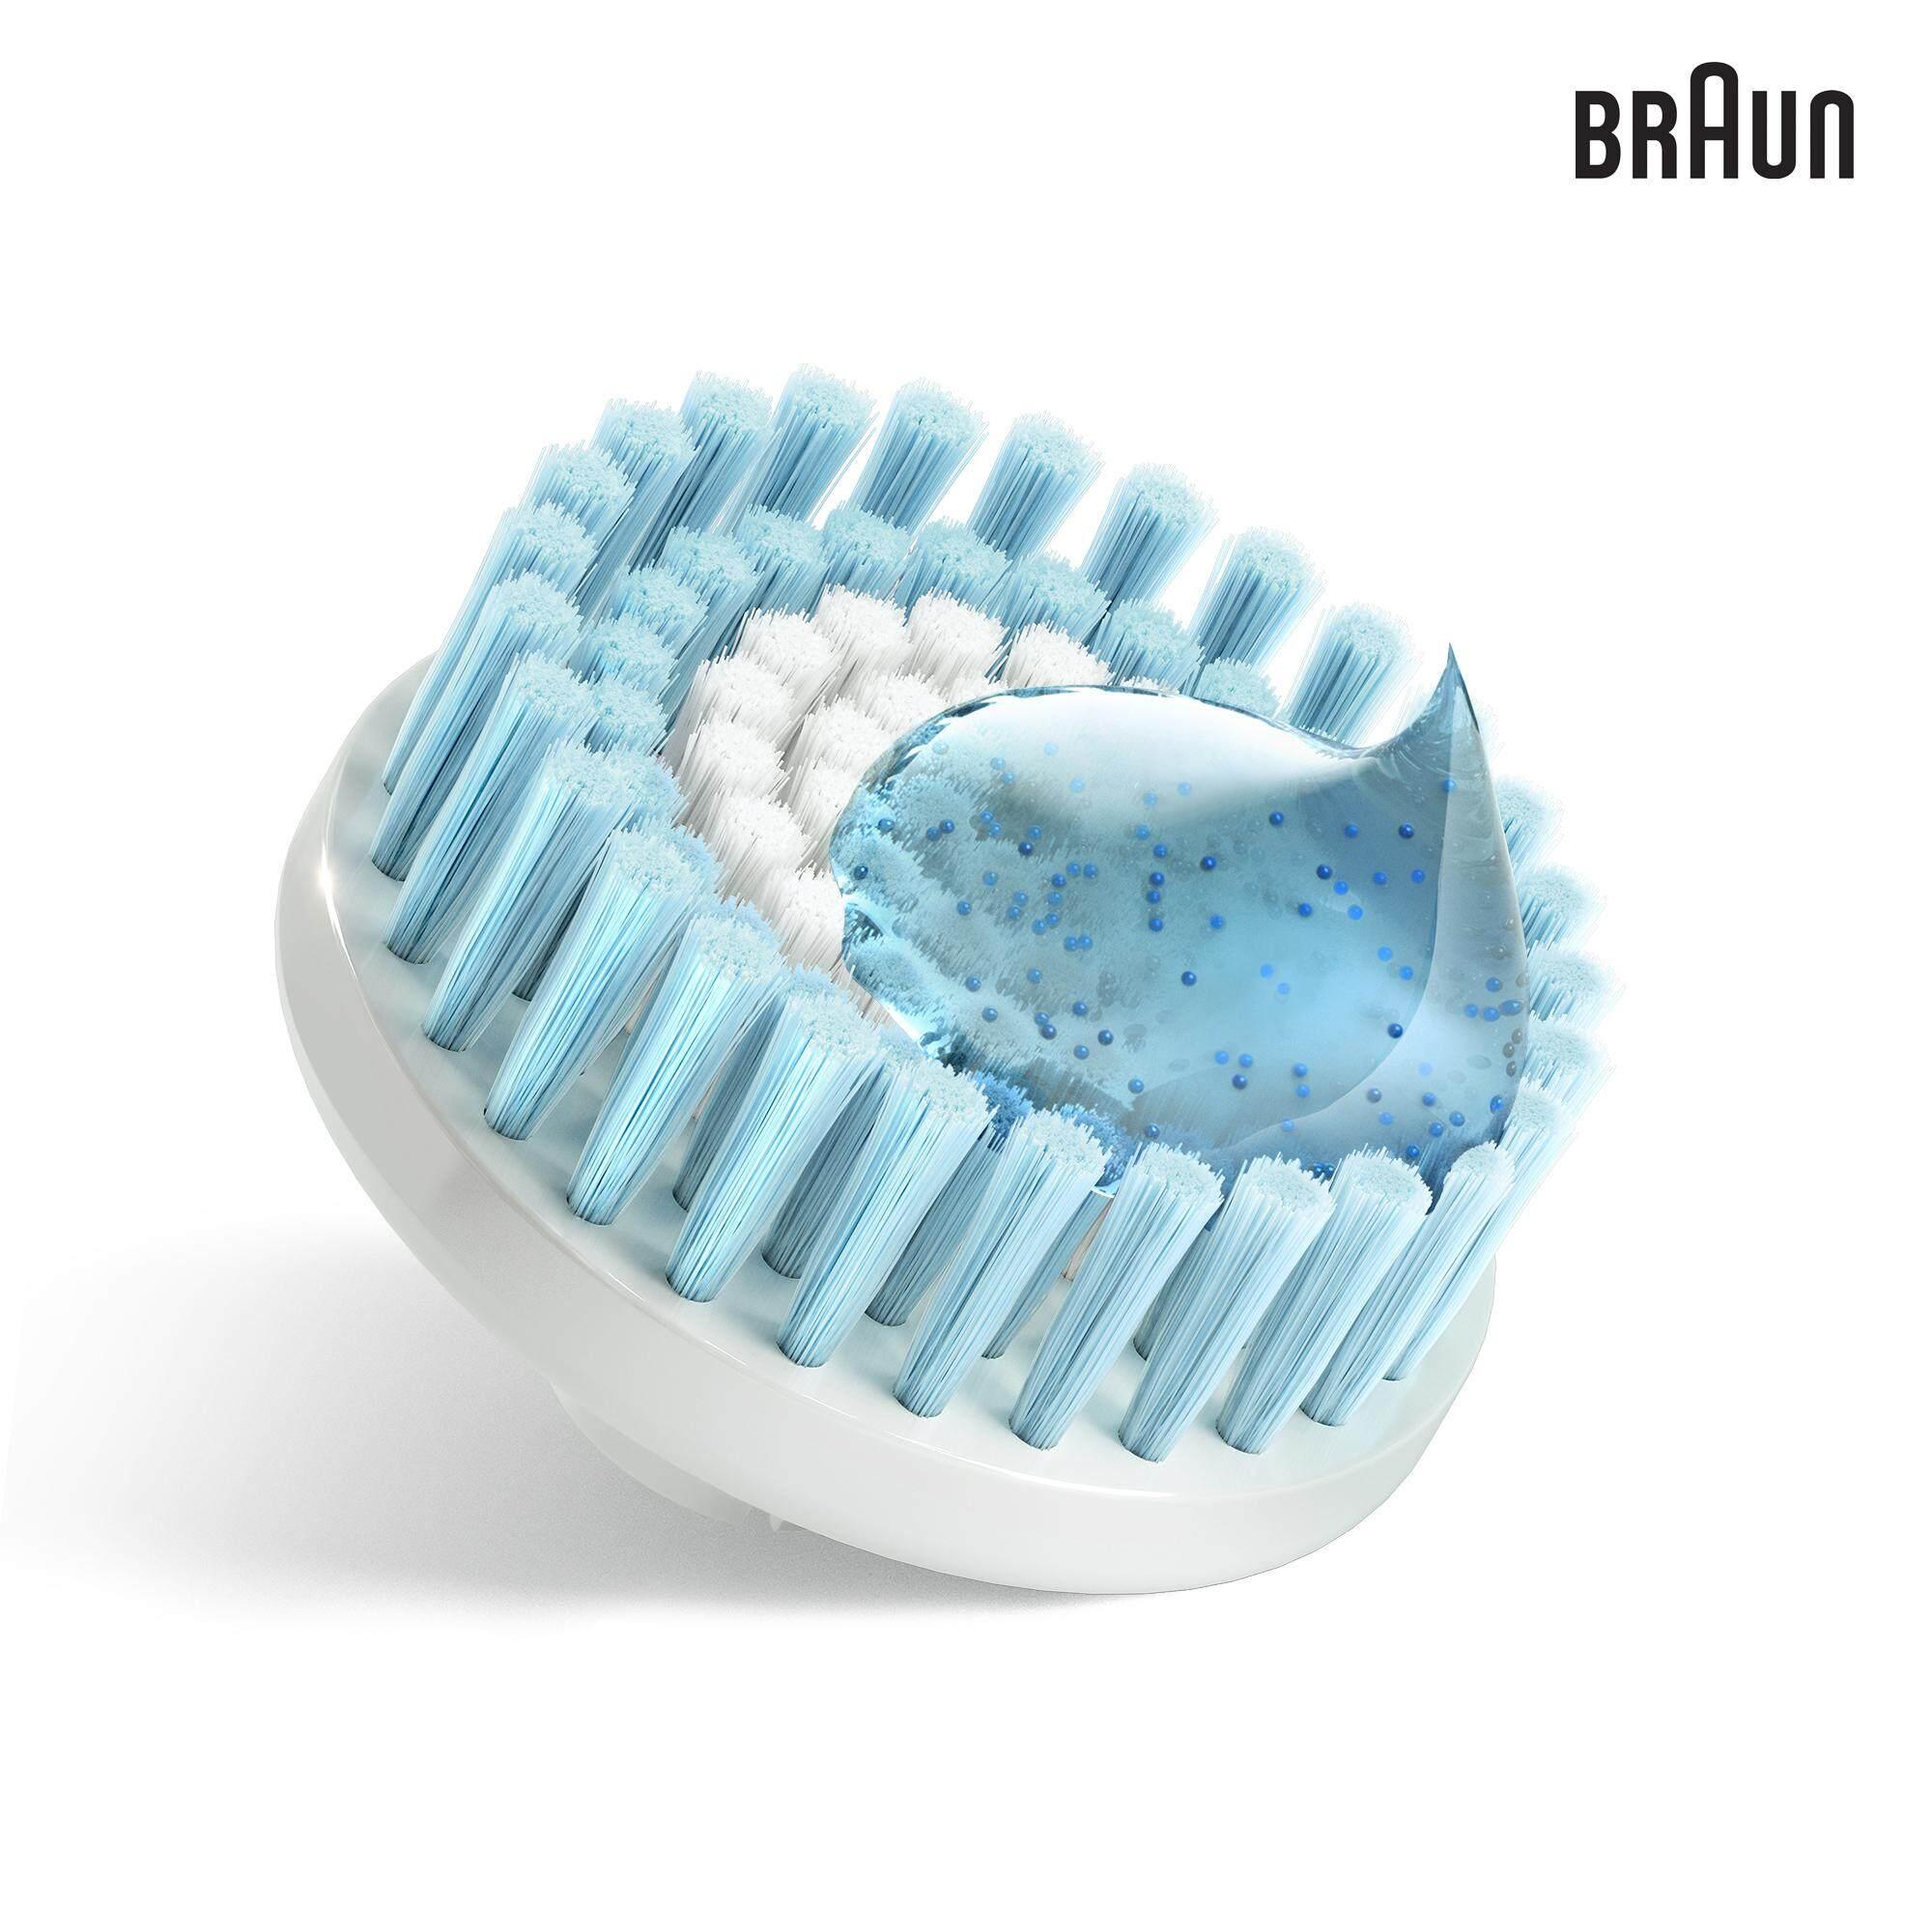 Braun Face 80-e - Pack of 2 Exfoliation Brush Refills - designed for Braun Face Cleansing Brush